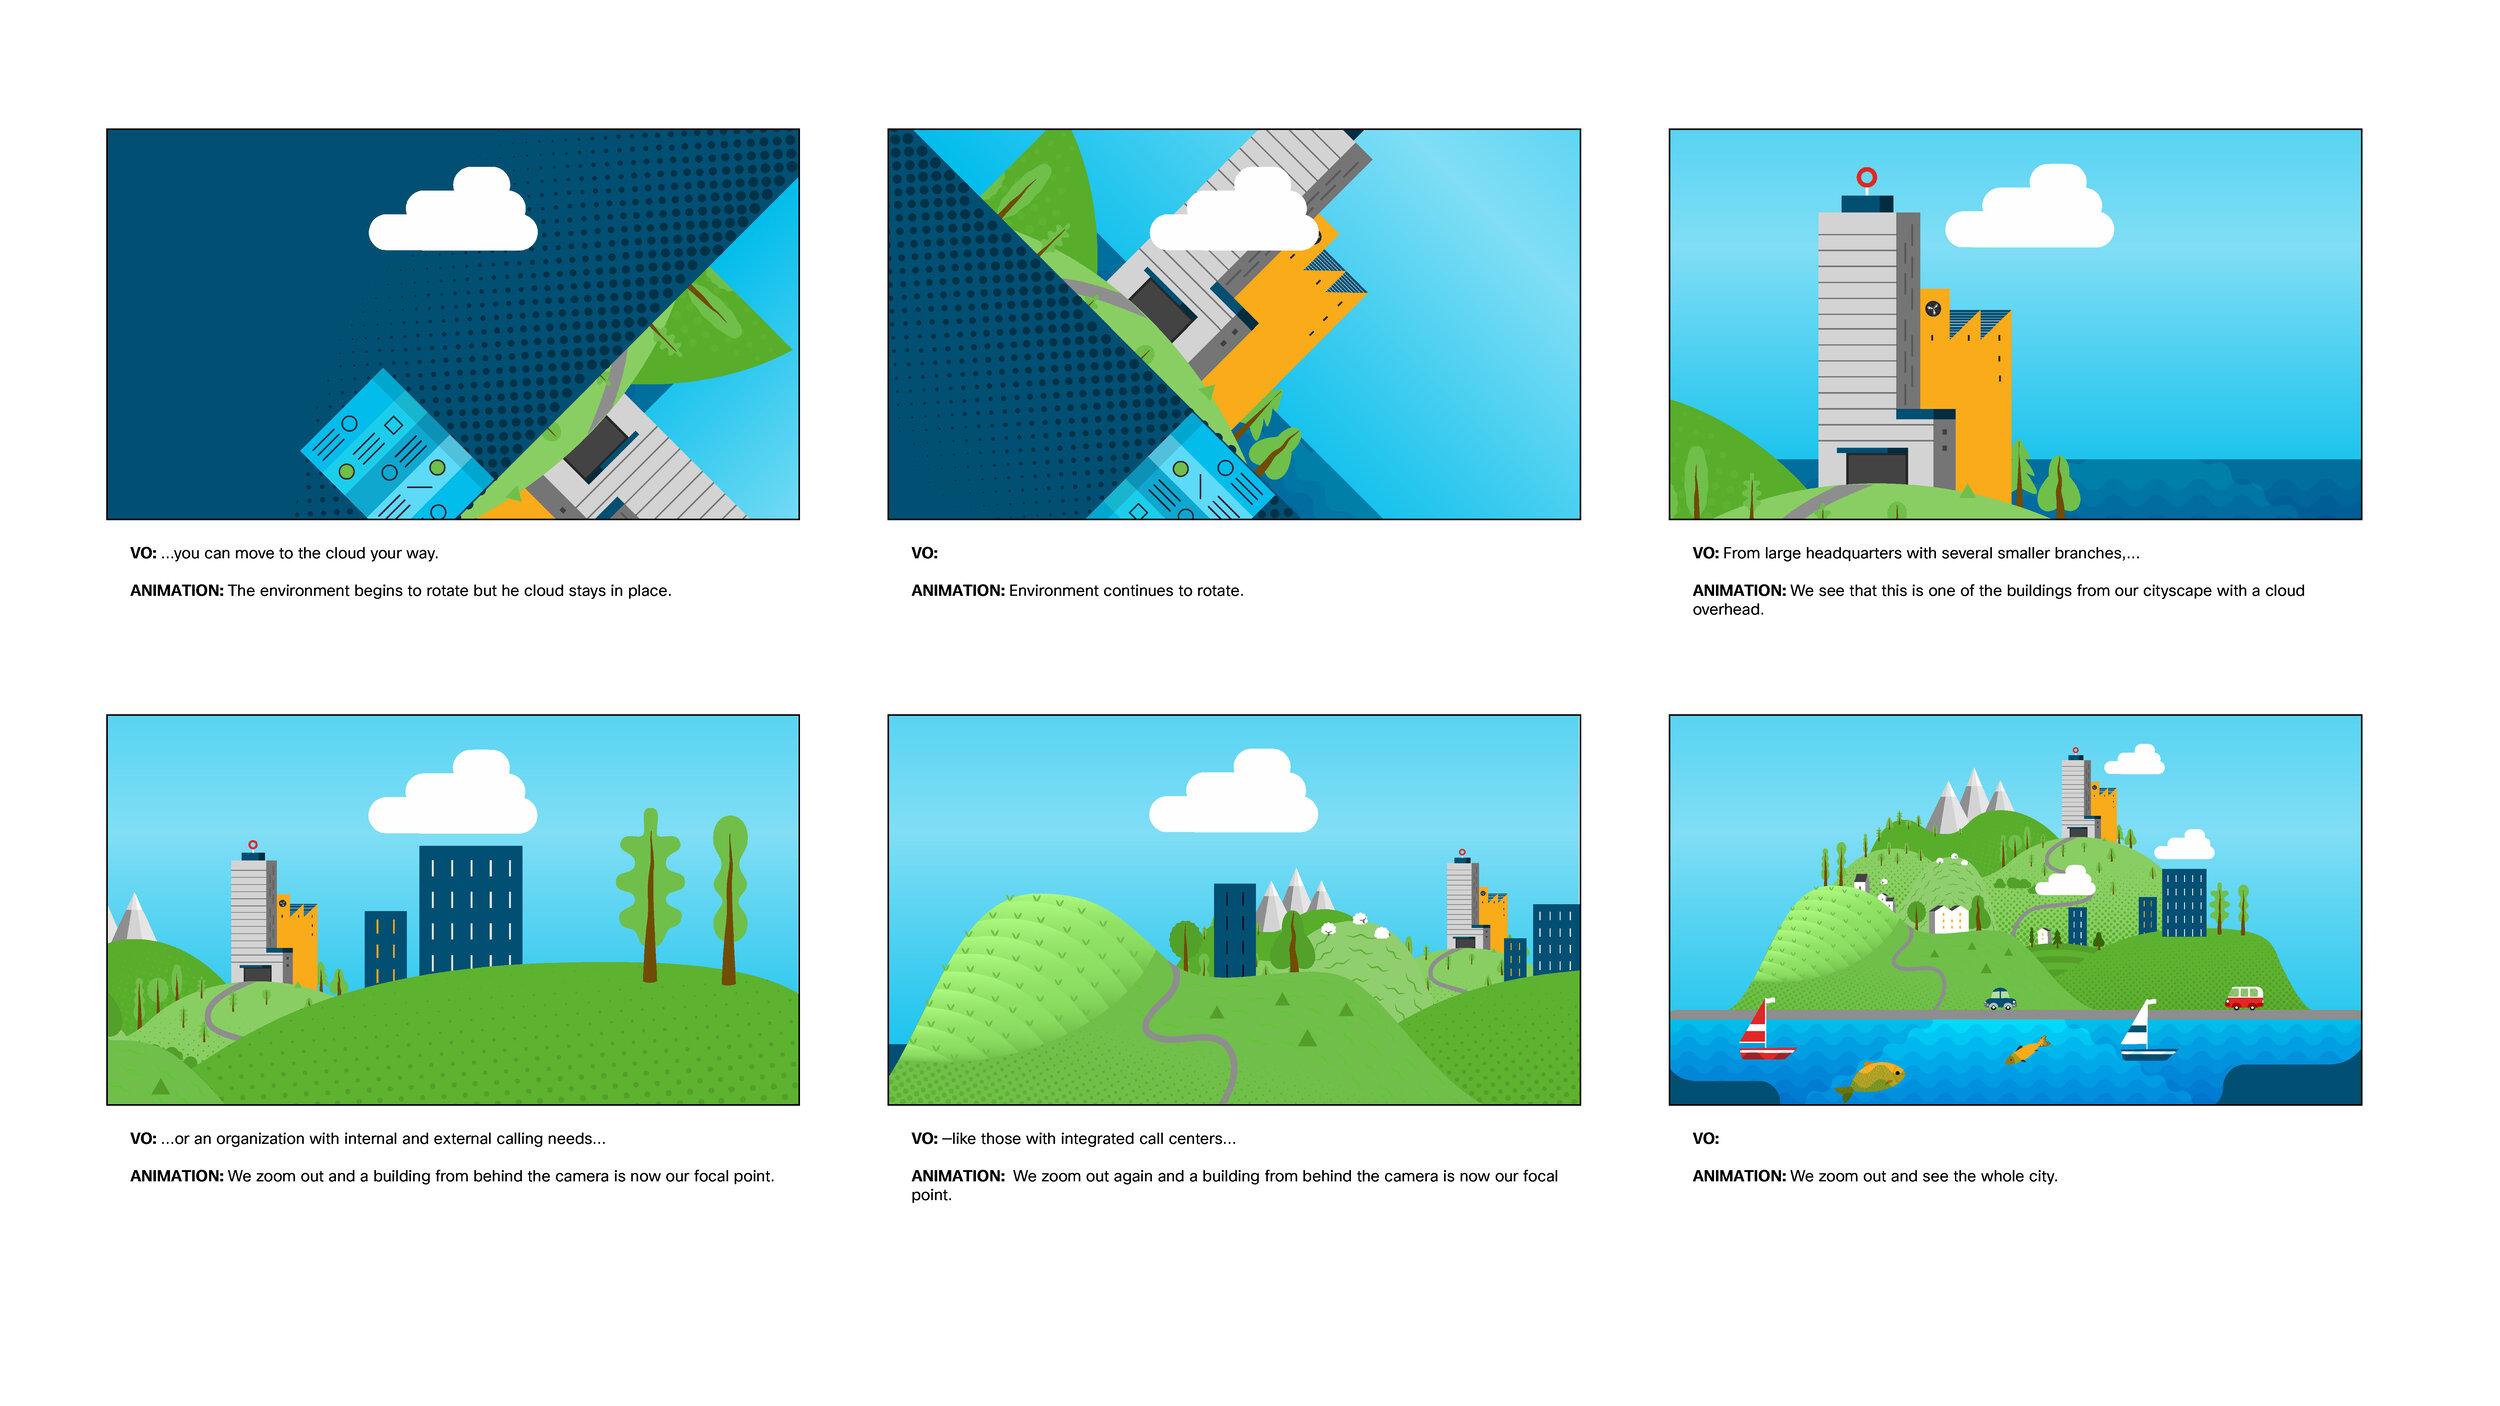 cisco-broadcloud-cloud-migration-storyboard-vo-r2-v2_Page_07.jpg